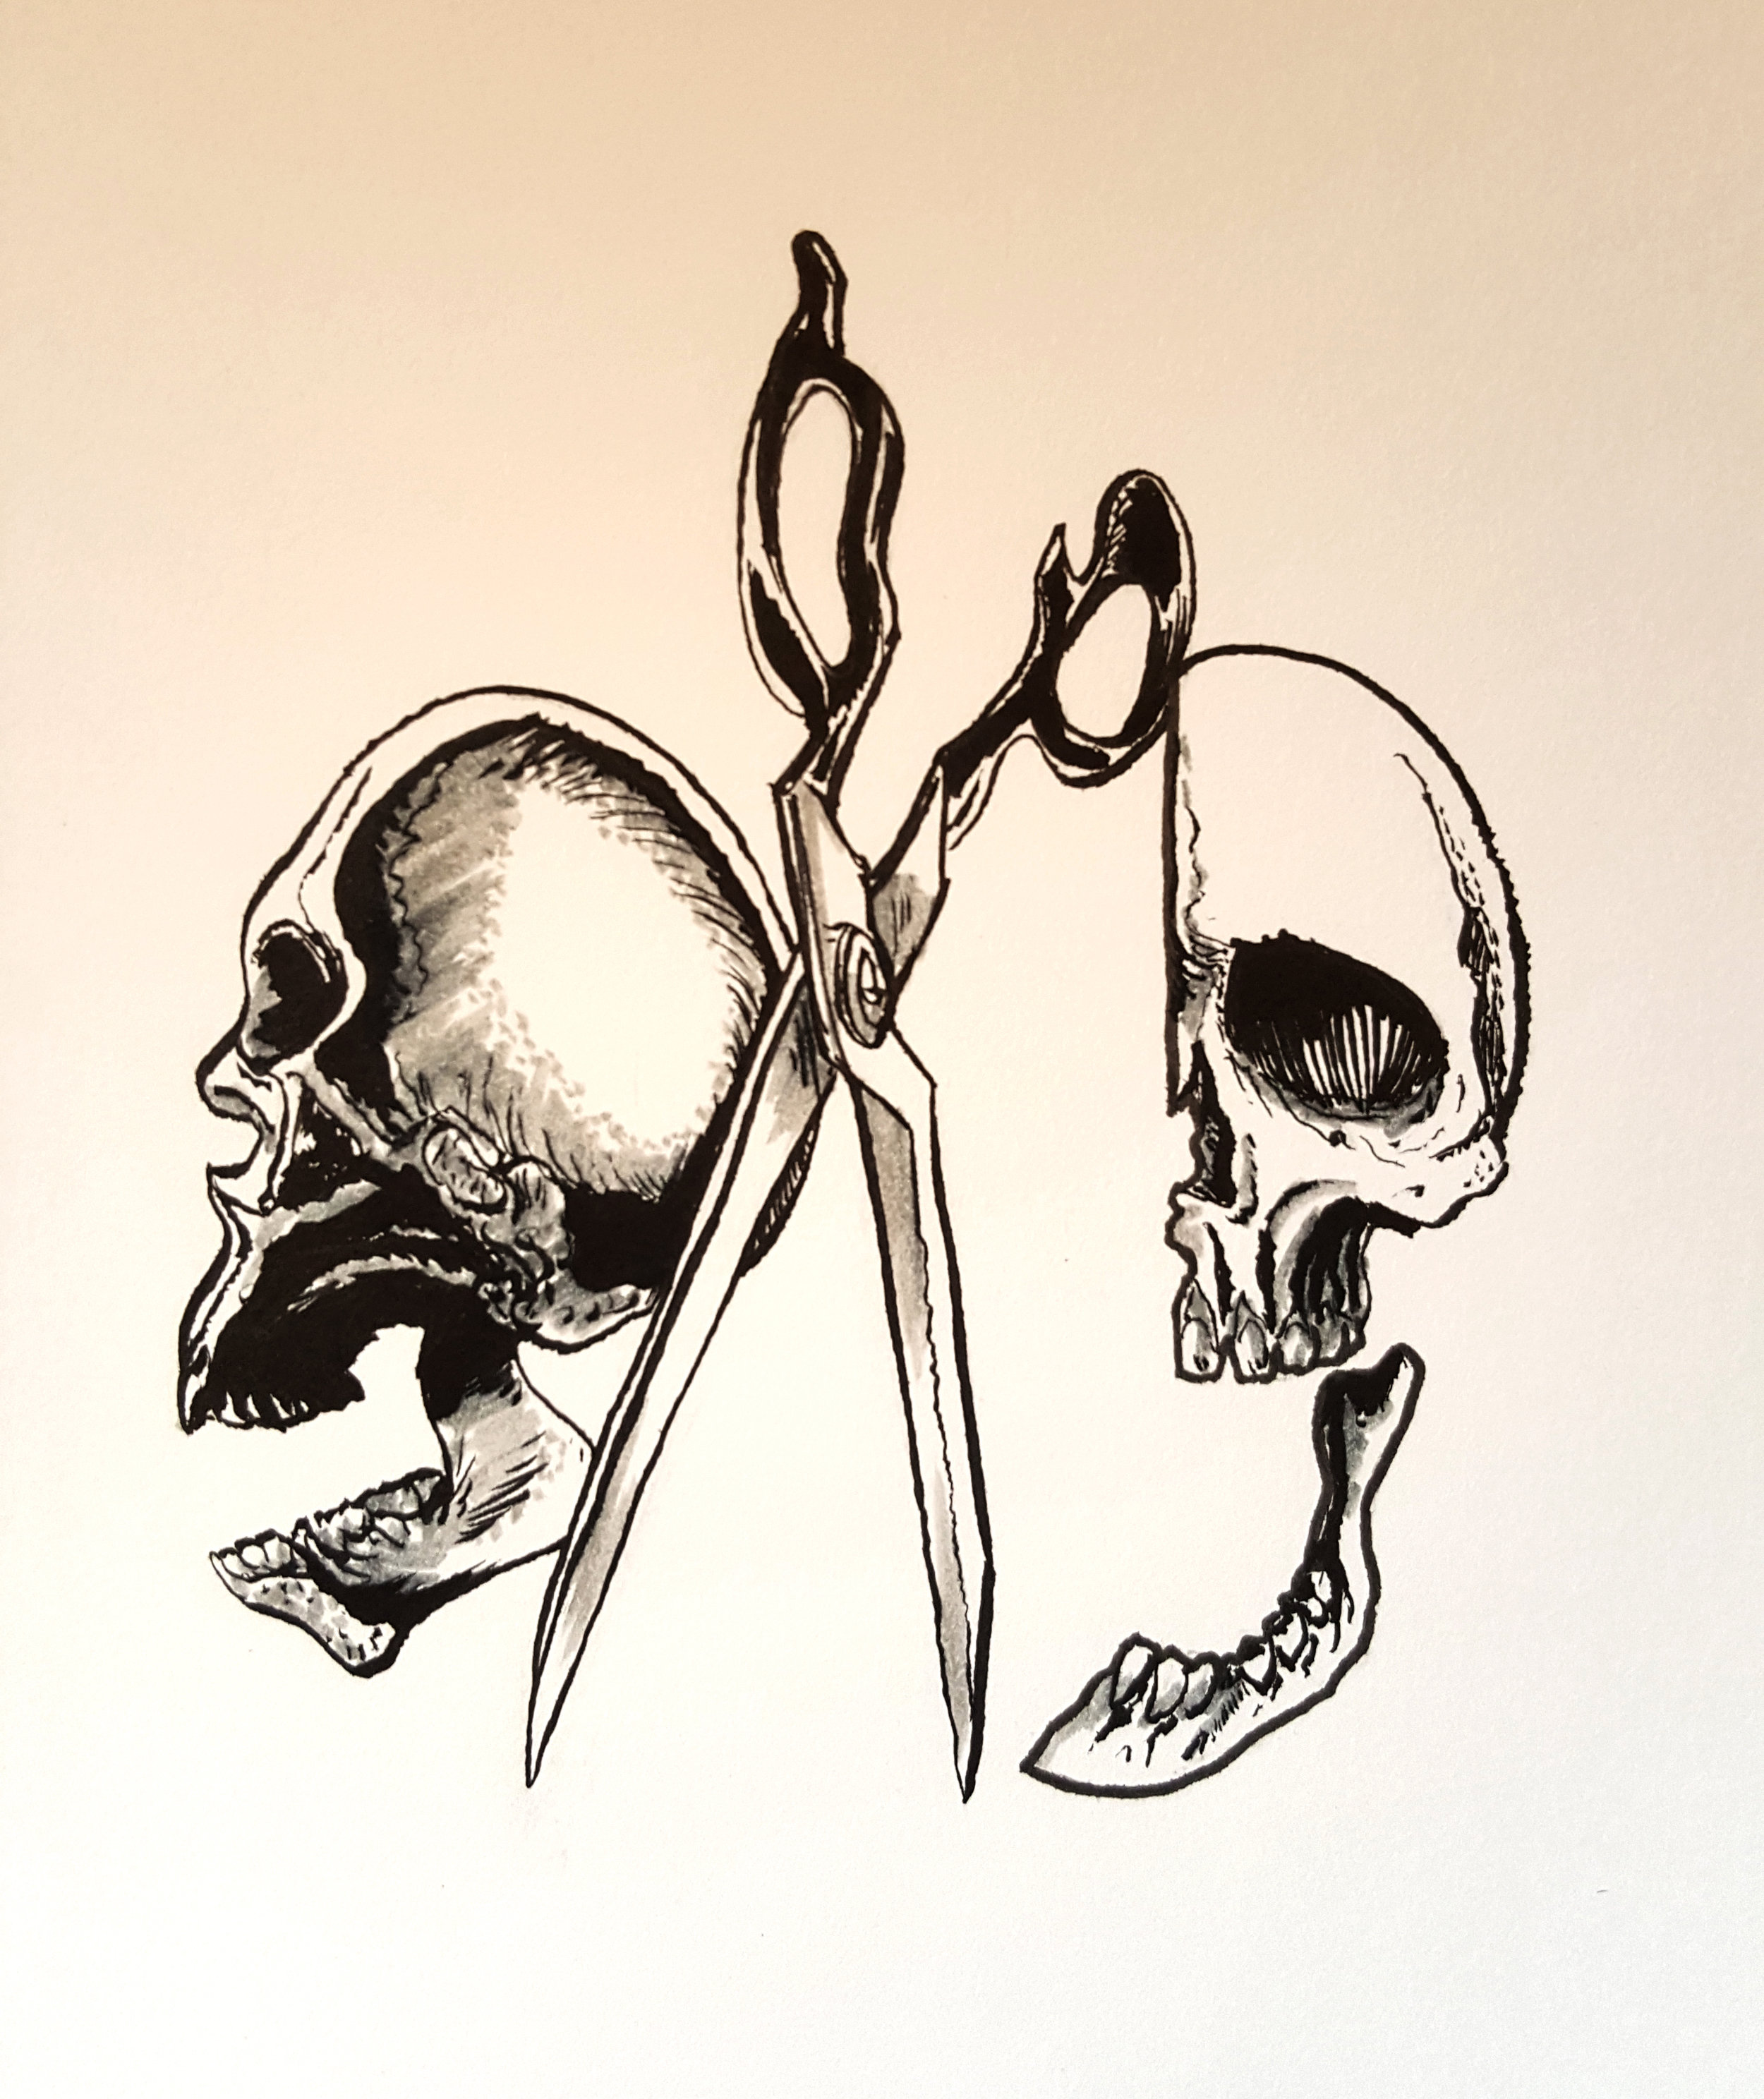 15_scissors.jpg